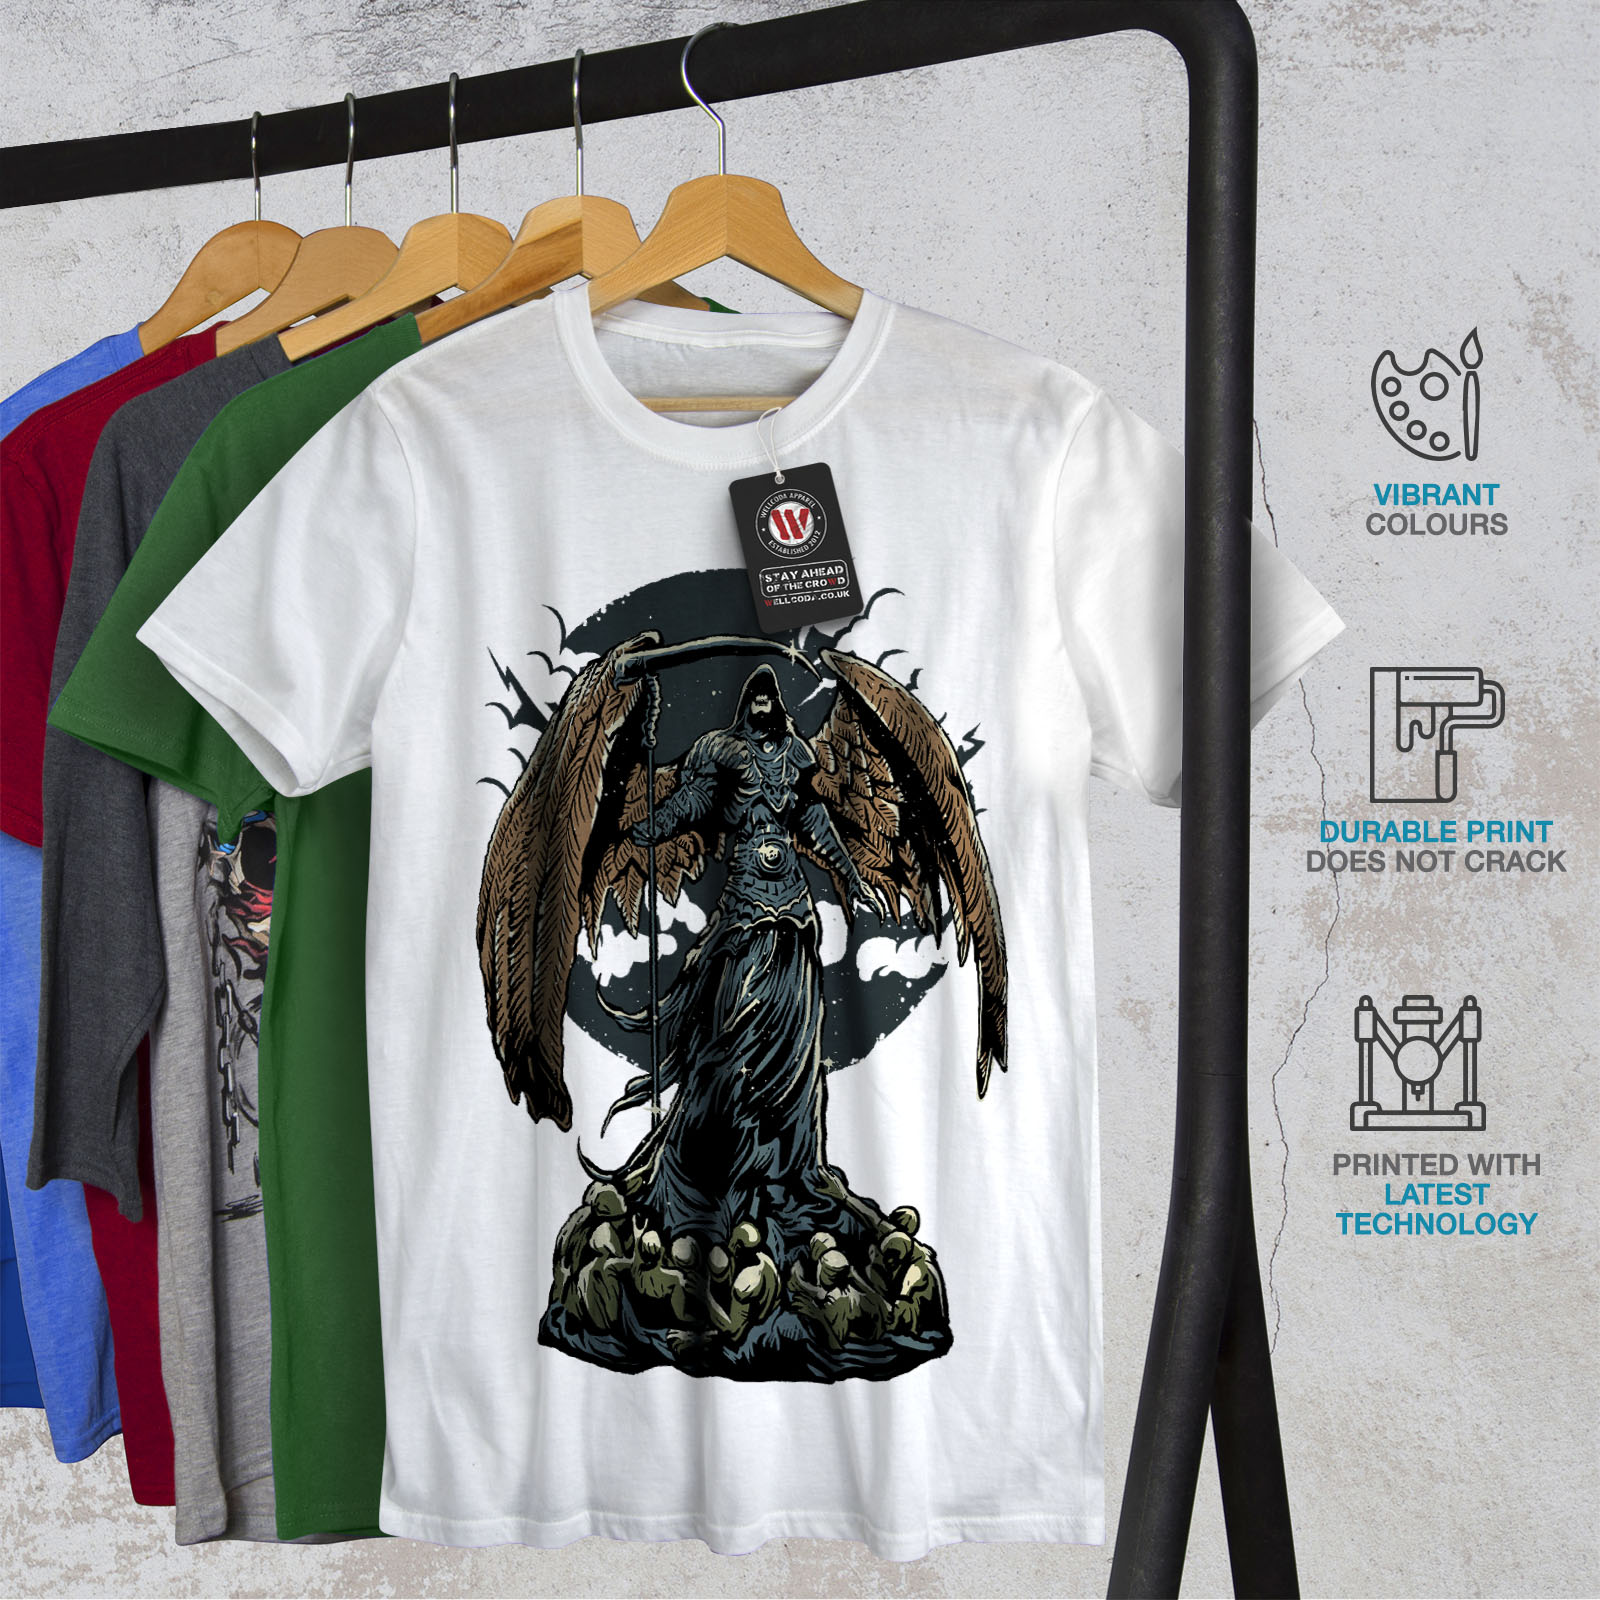 Wellcoda-Evil-Grim-Reaper-Mens-T-shirt-Horror-Graphic-Design-Printed-Tee thumbnail 12